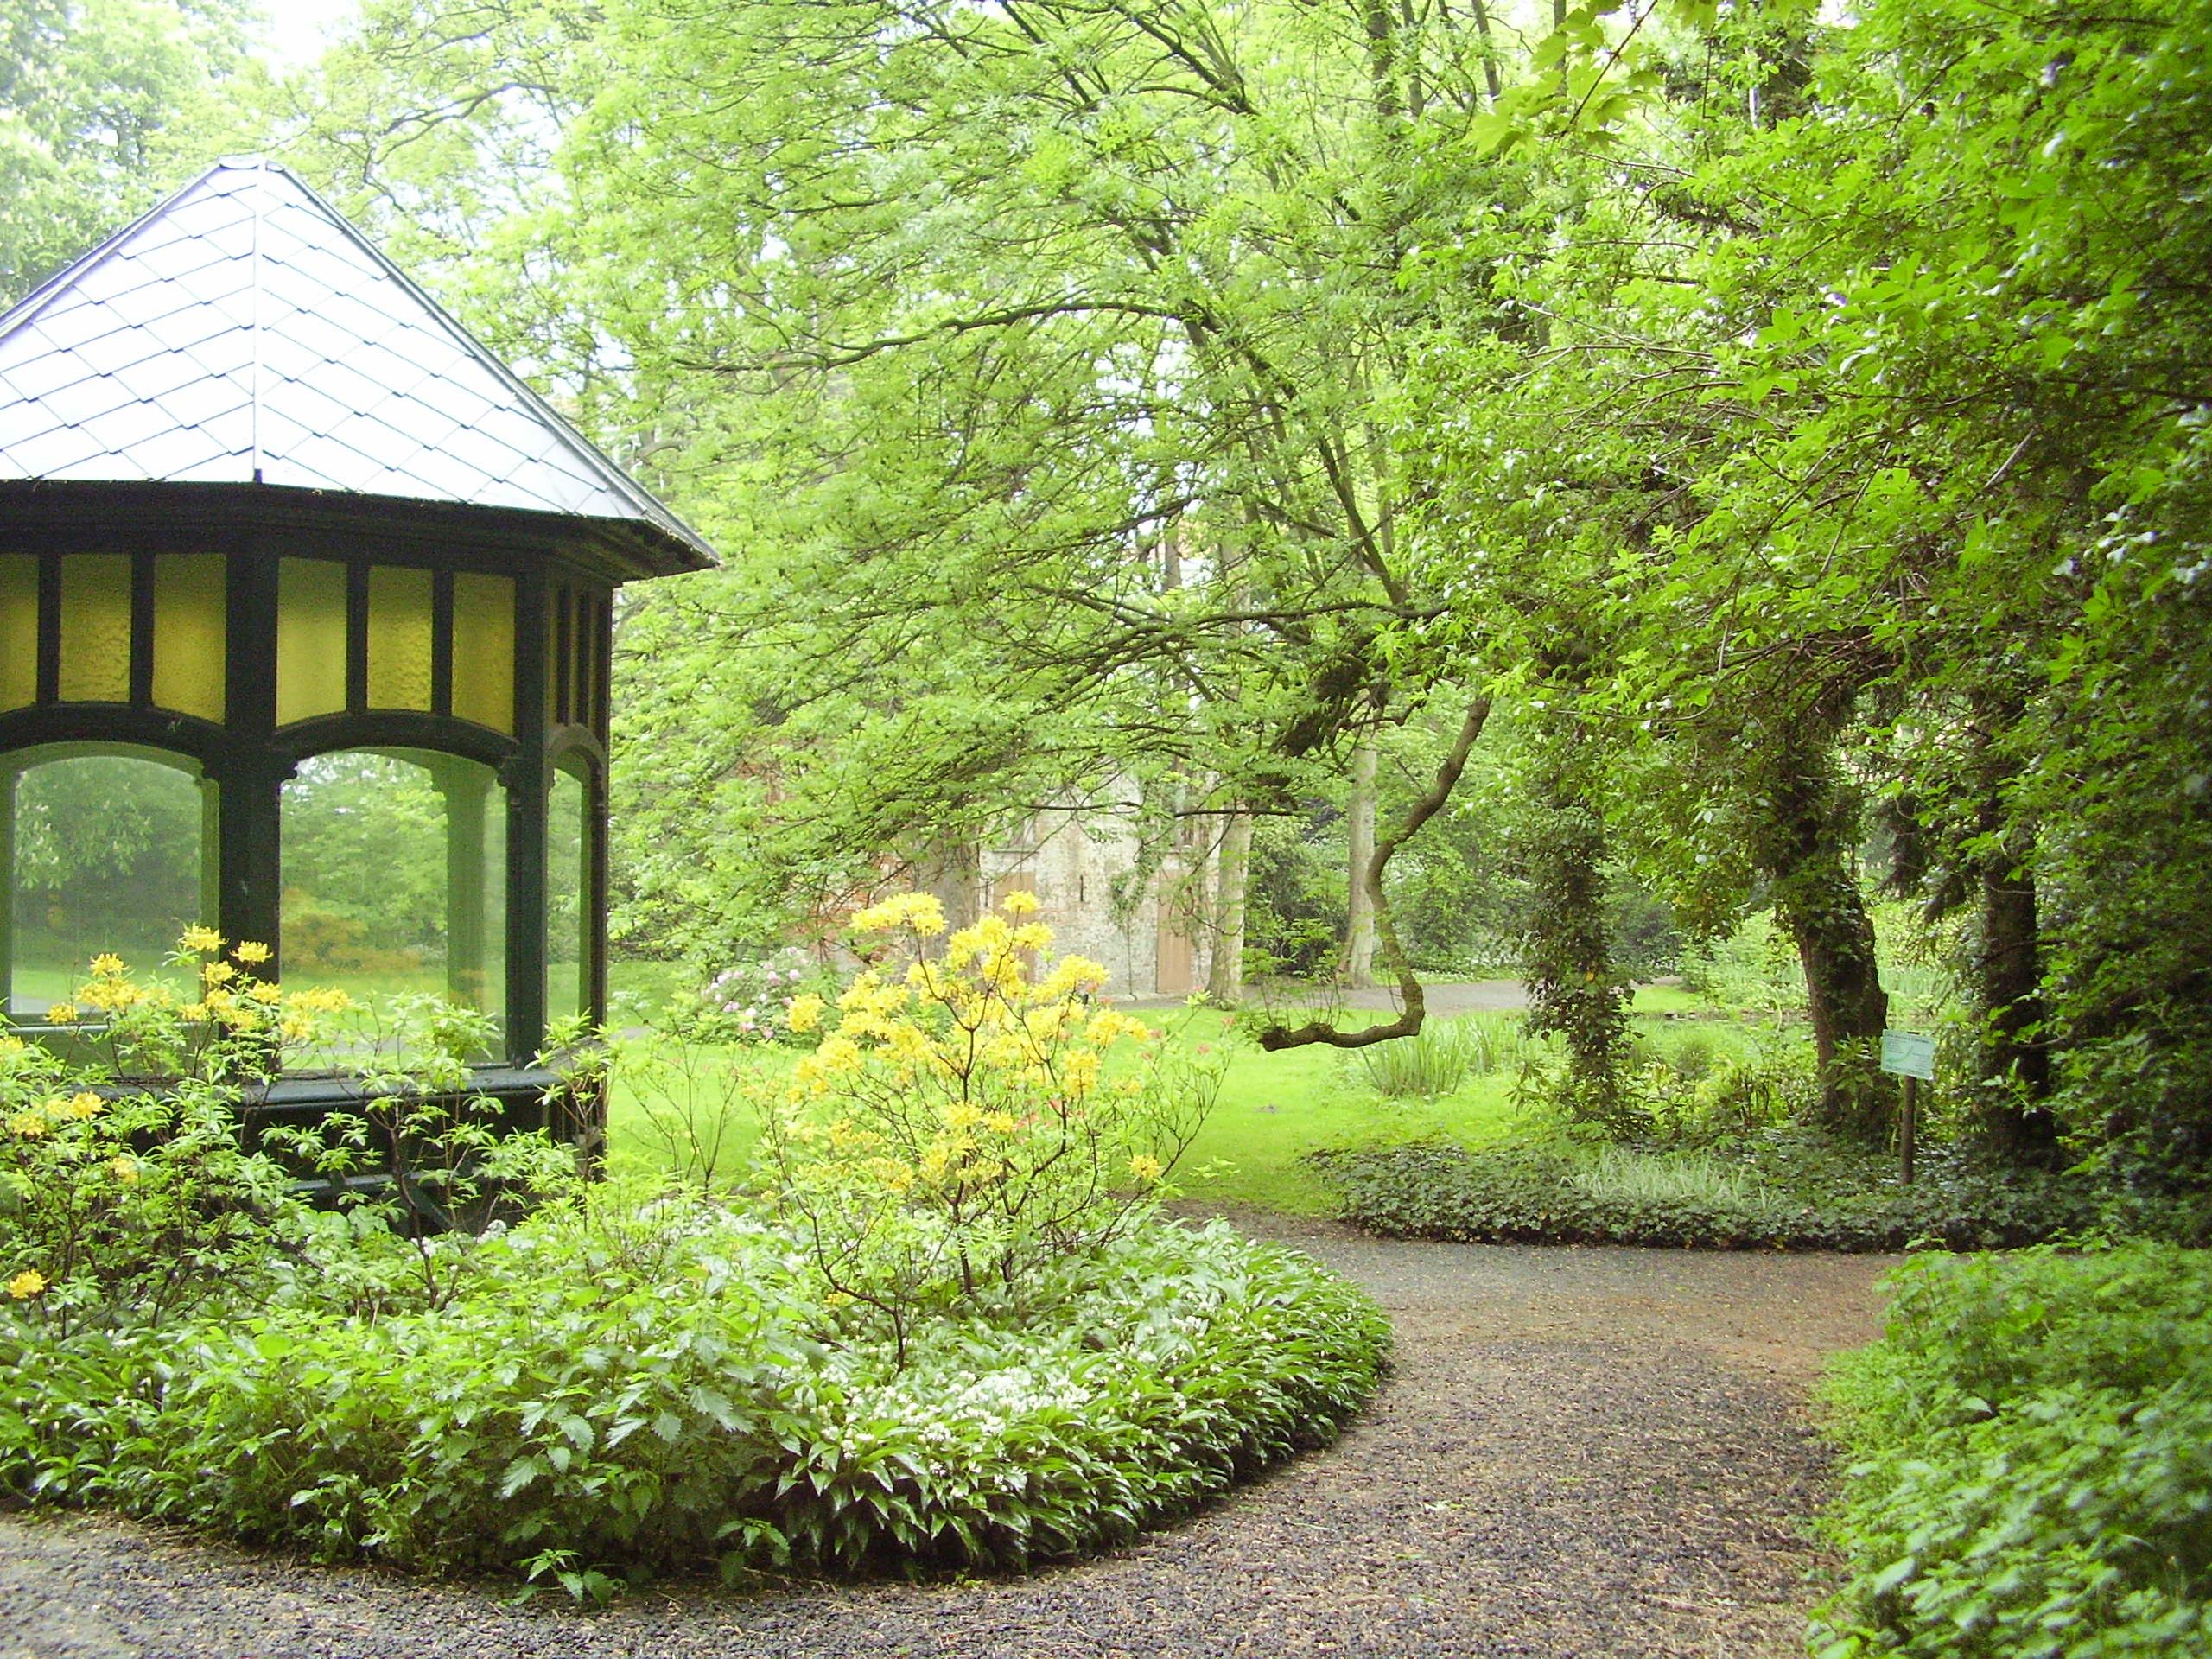 Choisir les supports de jardin deco in for Choisir plantes jardin